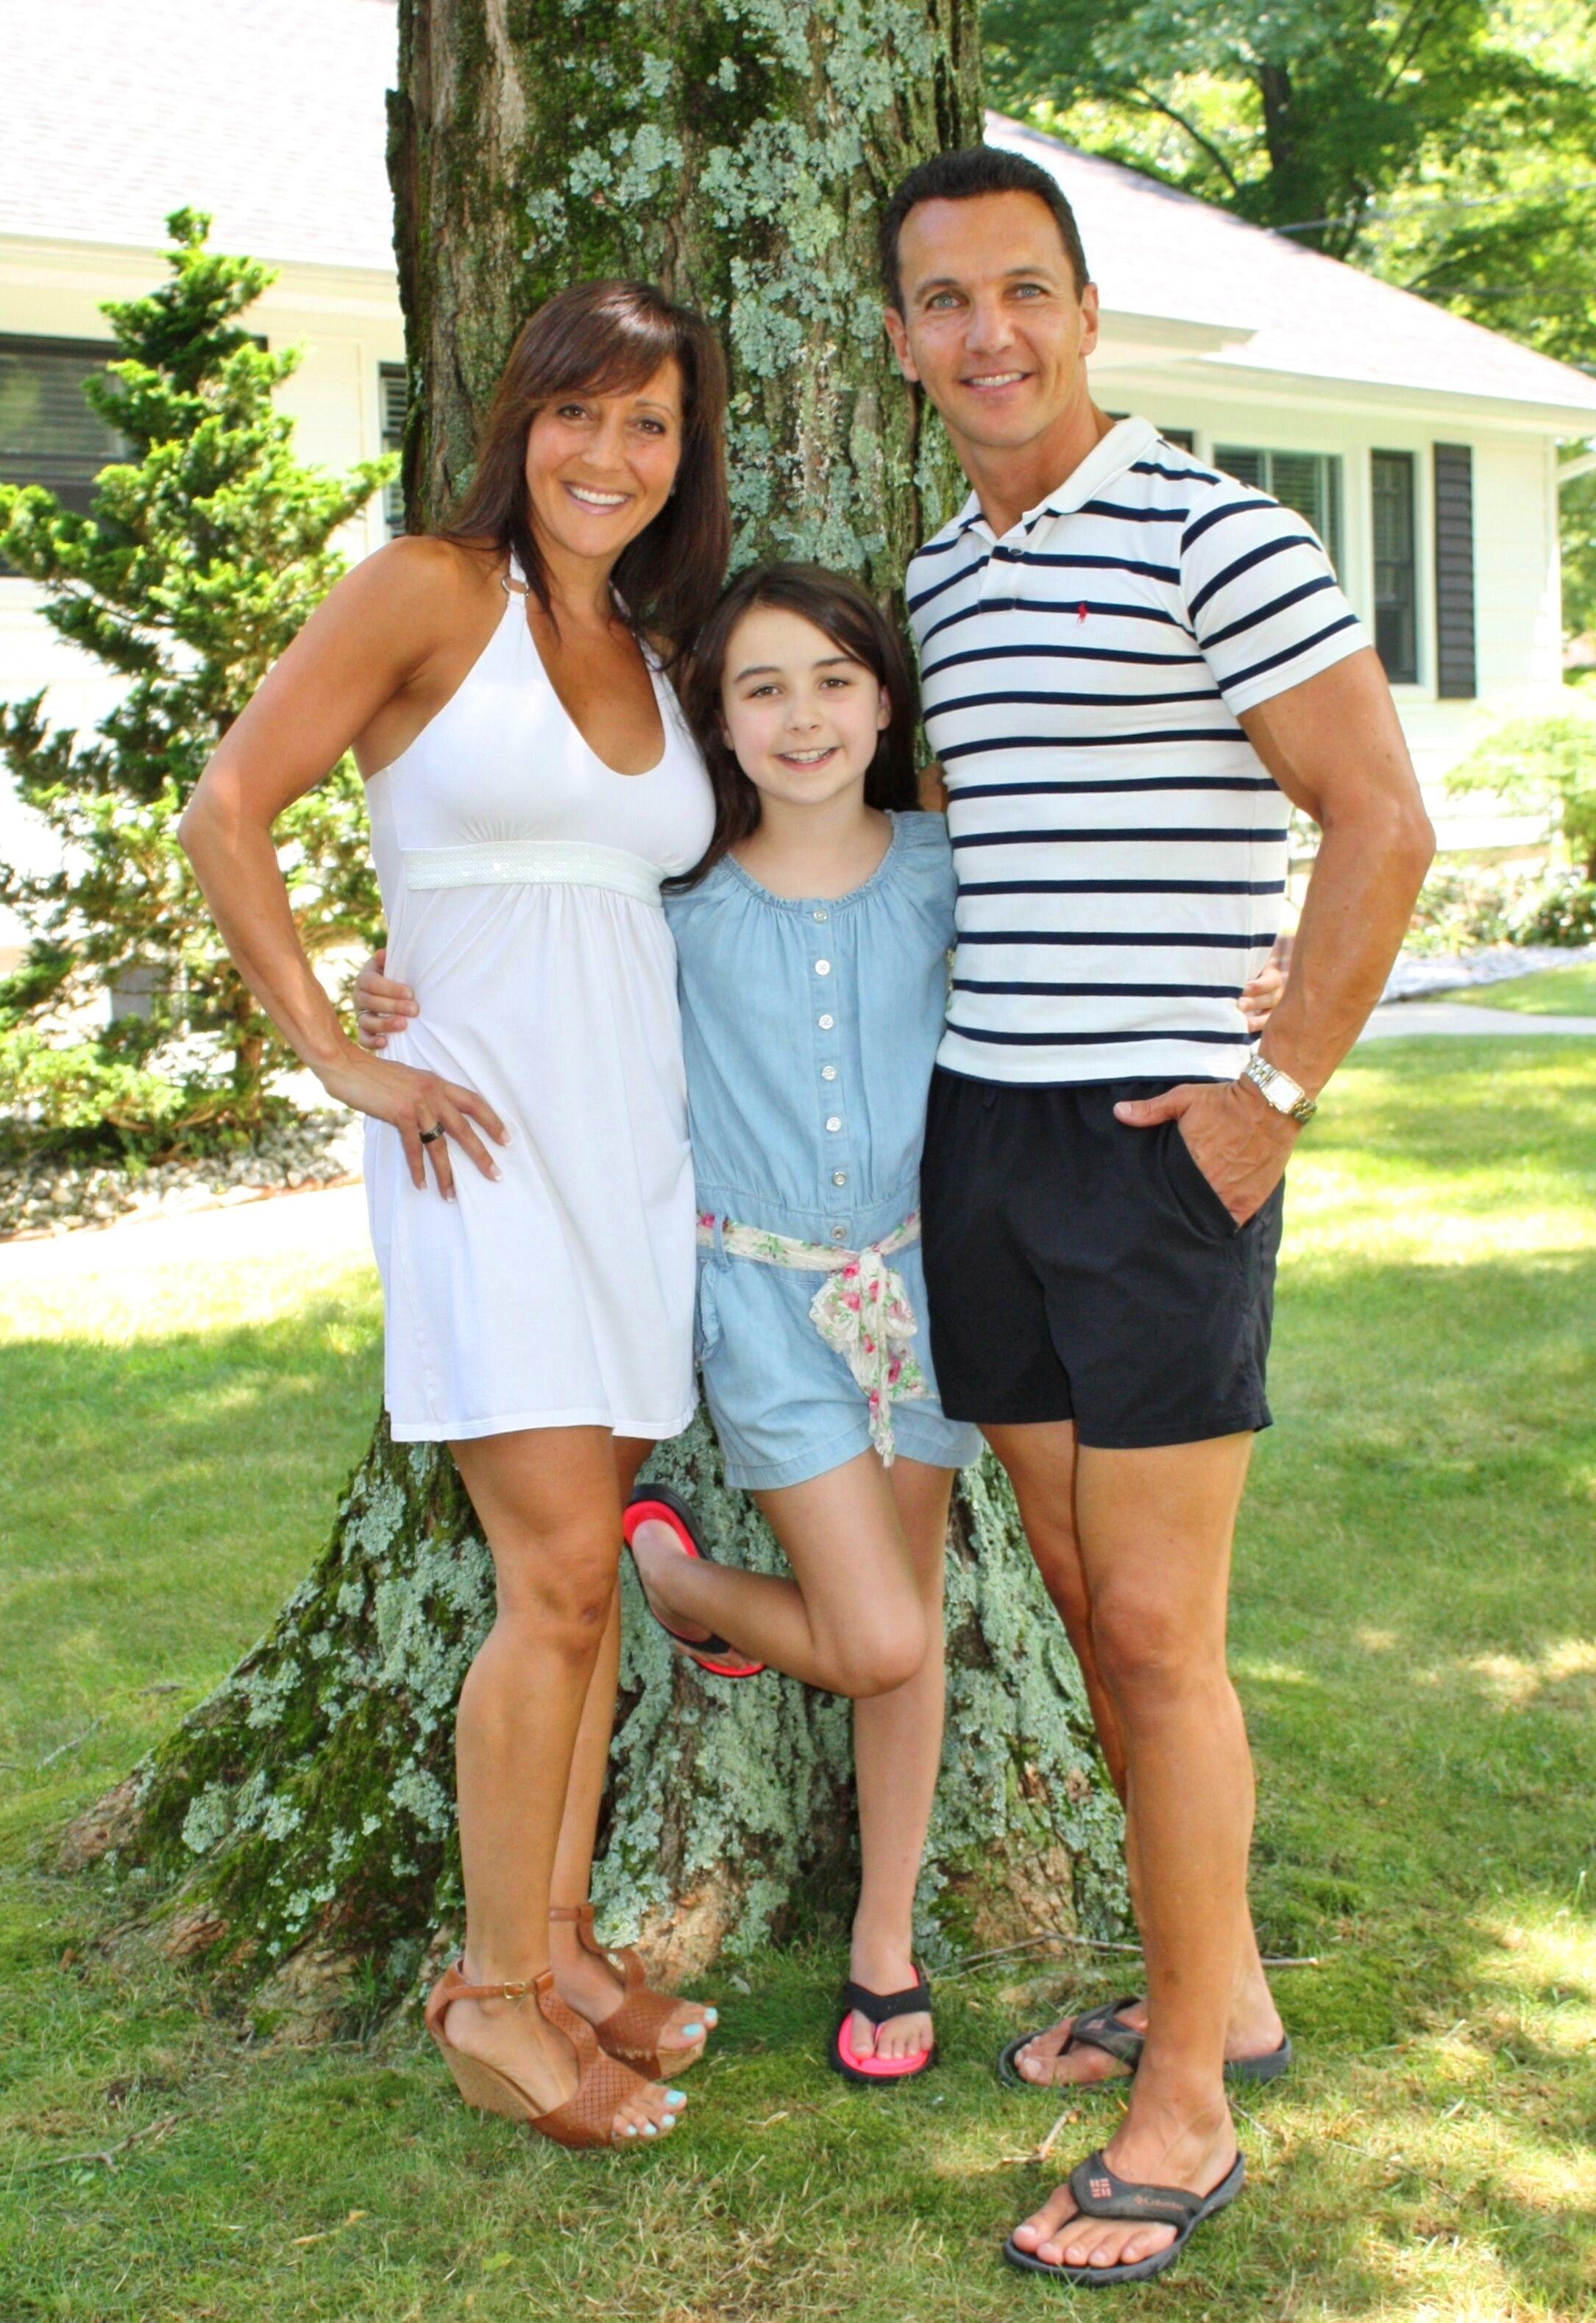 The Pedalino Family